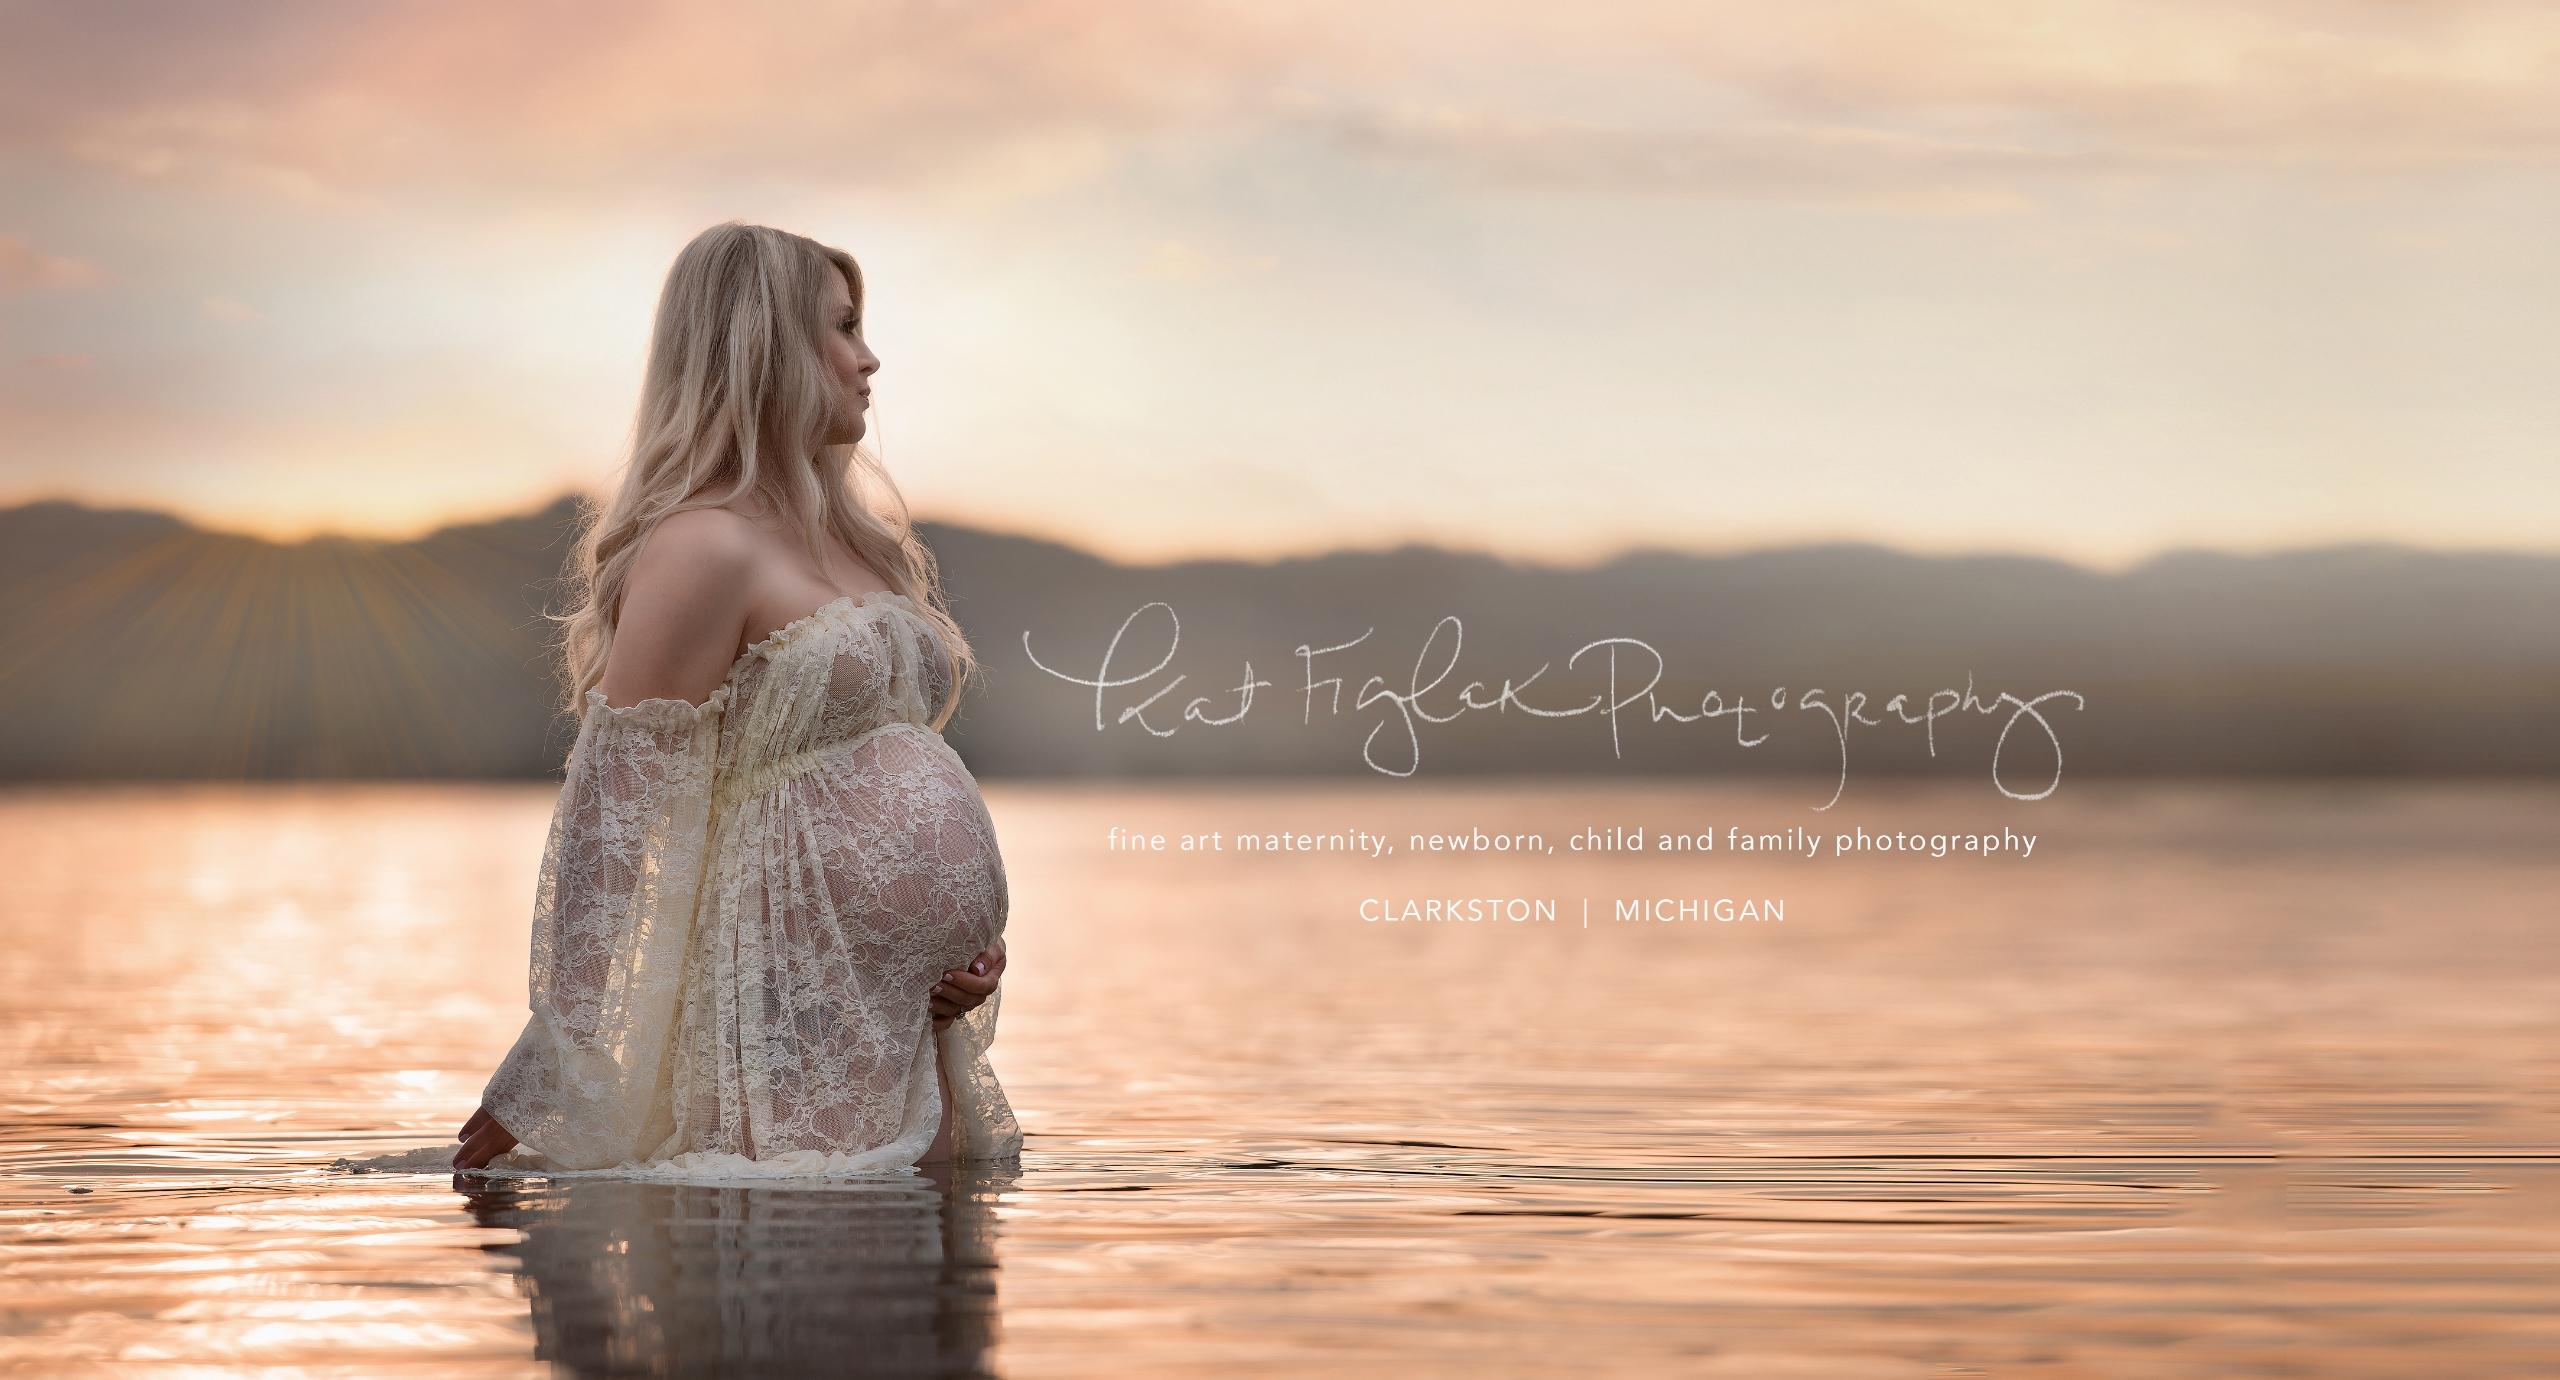 Kat Figlak Photob (@katfiglakphotography) Cover Image